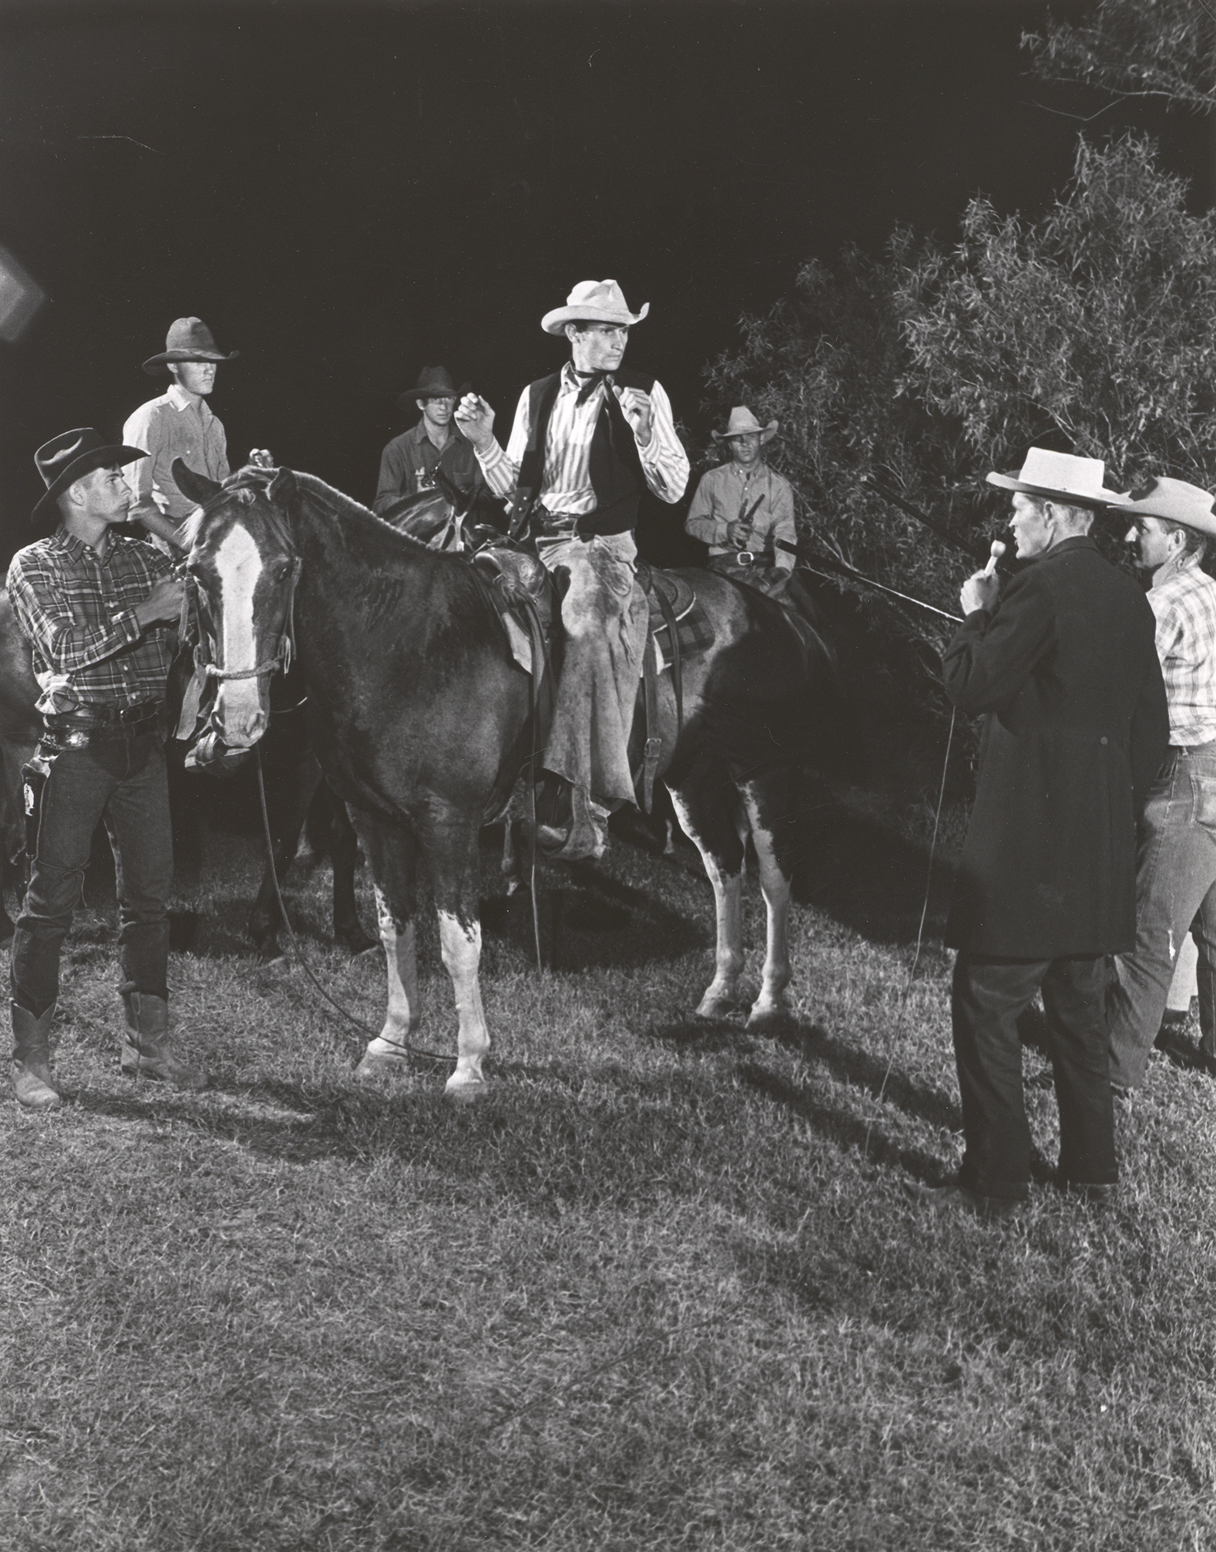 George Harvick, Terry Moberly, Bill Farmer, Harold Law, Richard Middlebrook (singing), Clifford Teinert (horseback).jpg